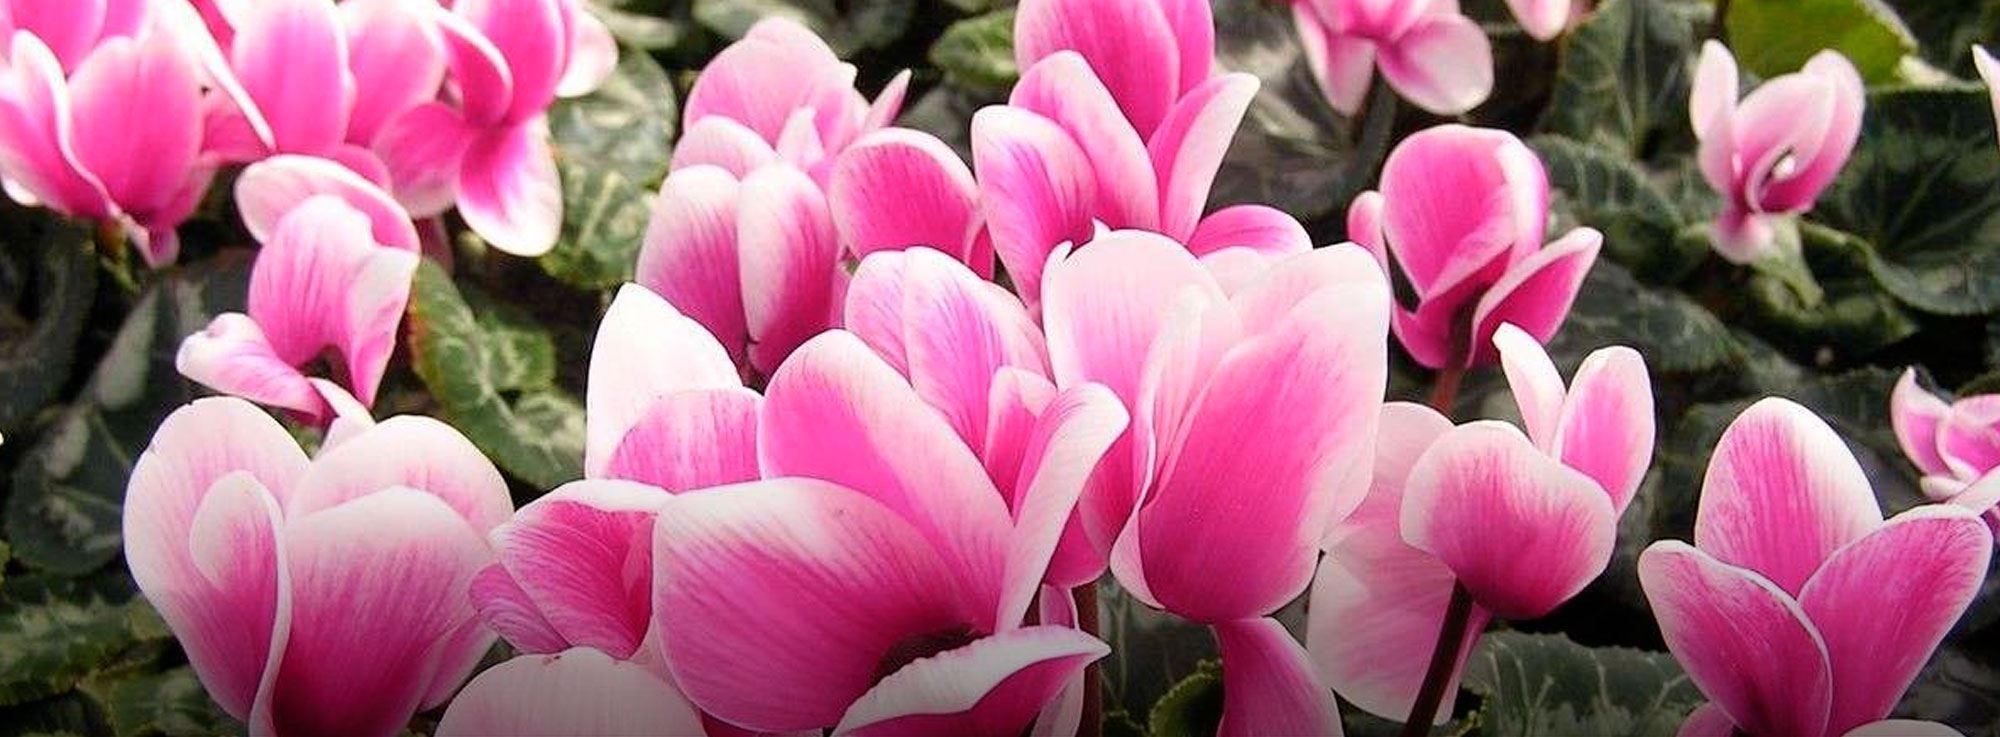 Bari: Requiem des fleurs